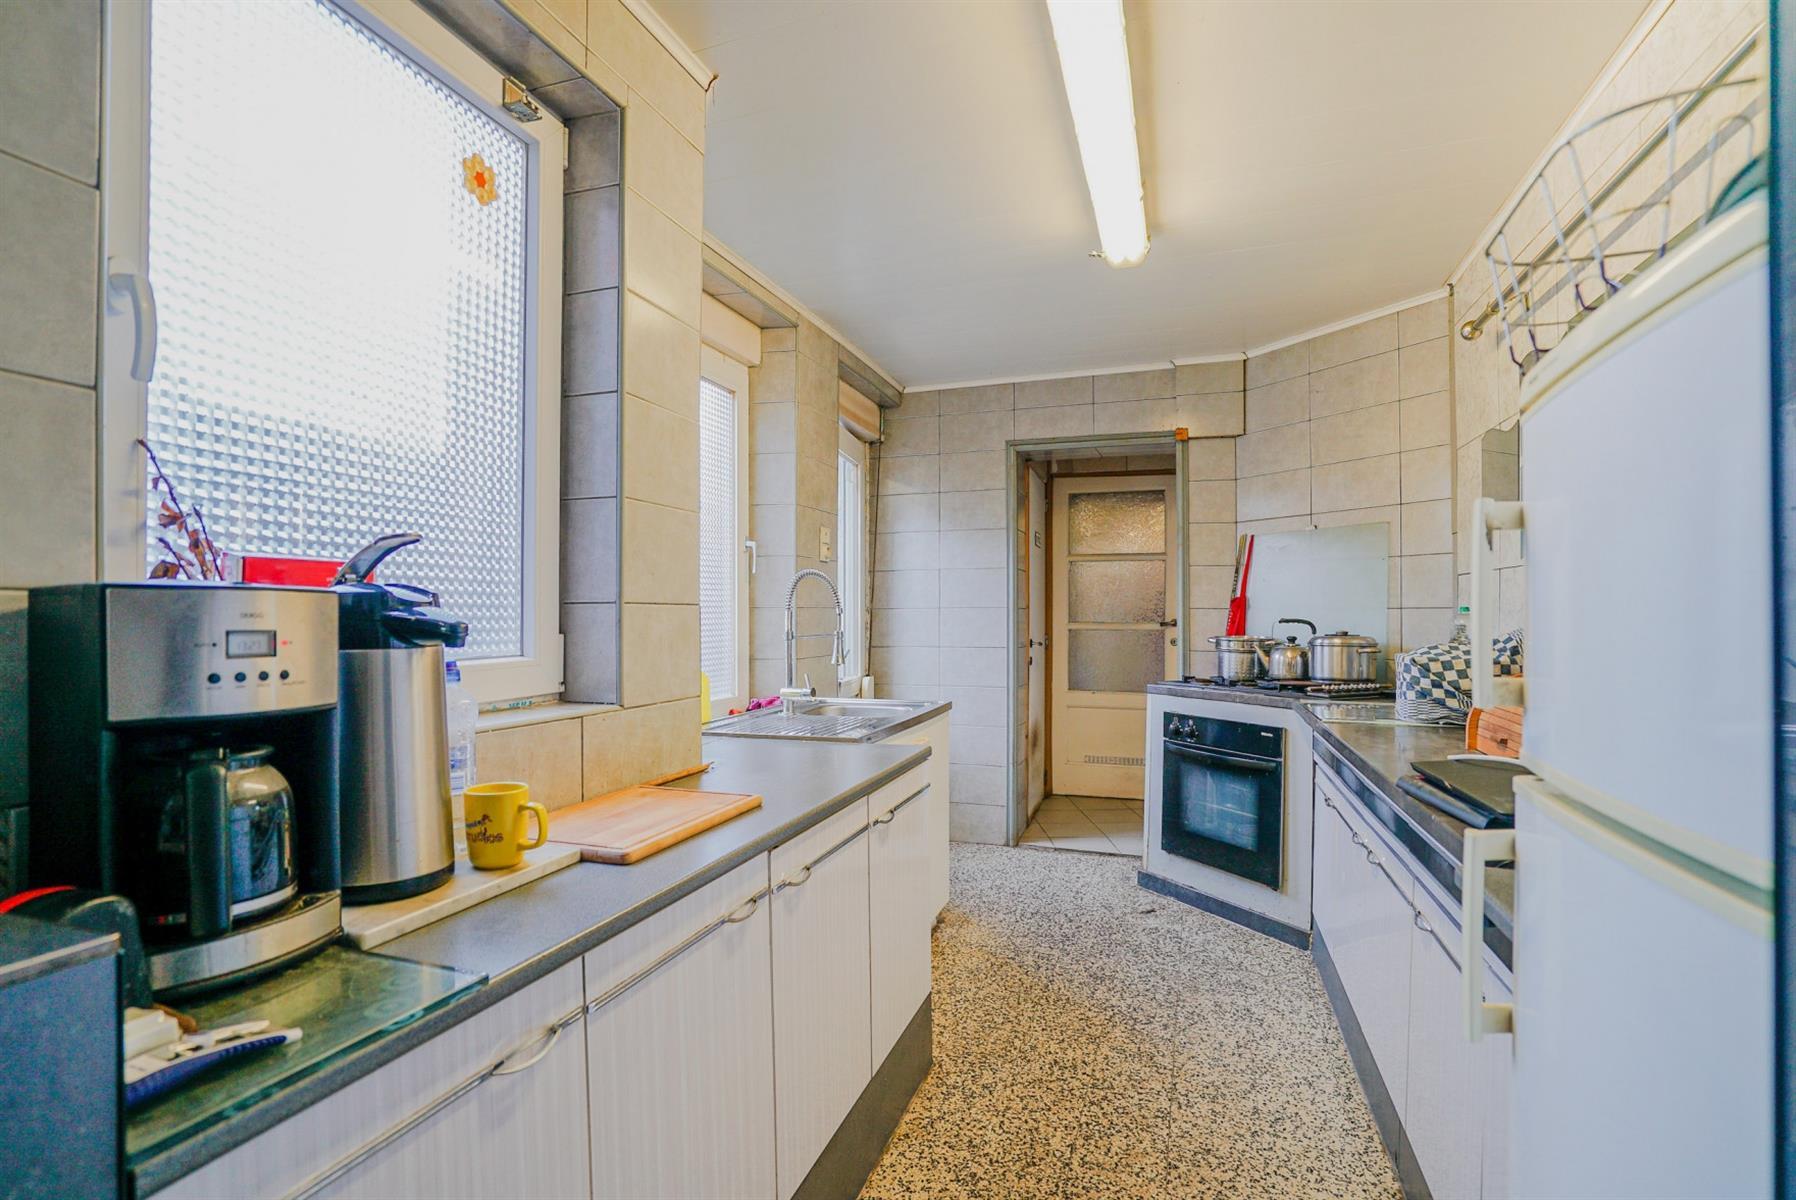 Maison - Oupeye Hermallesous-Argenteau - #4324098-6